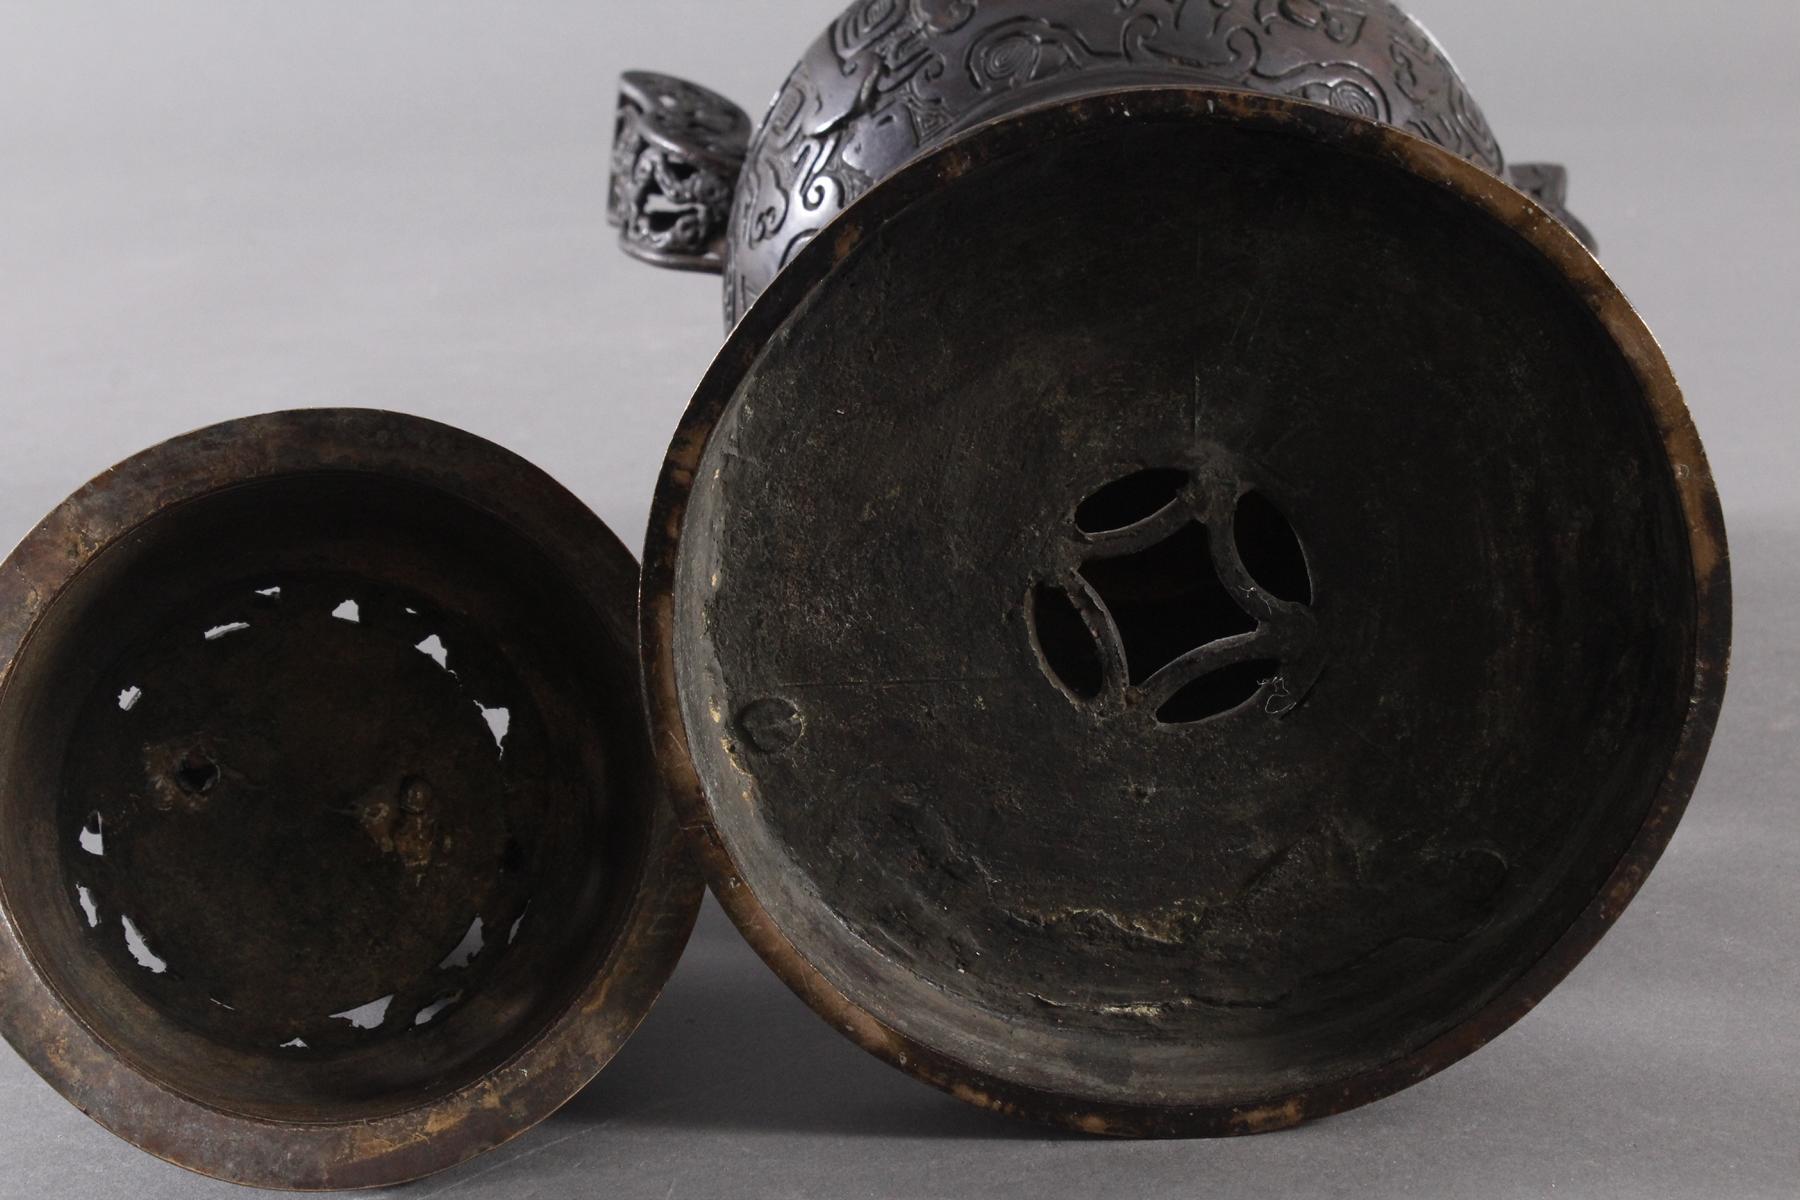 Großer Räucherkoro aus Bronze, China um 1900-10